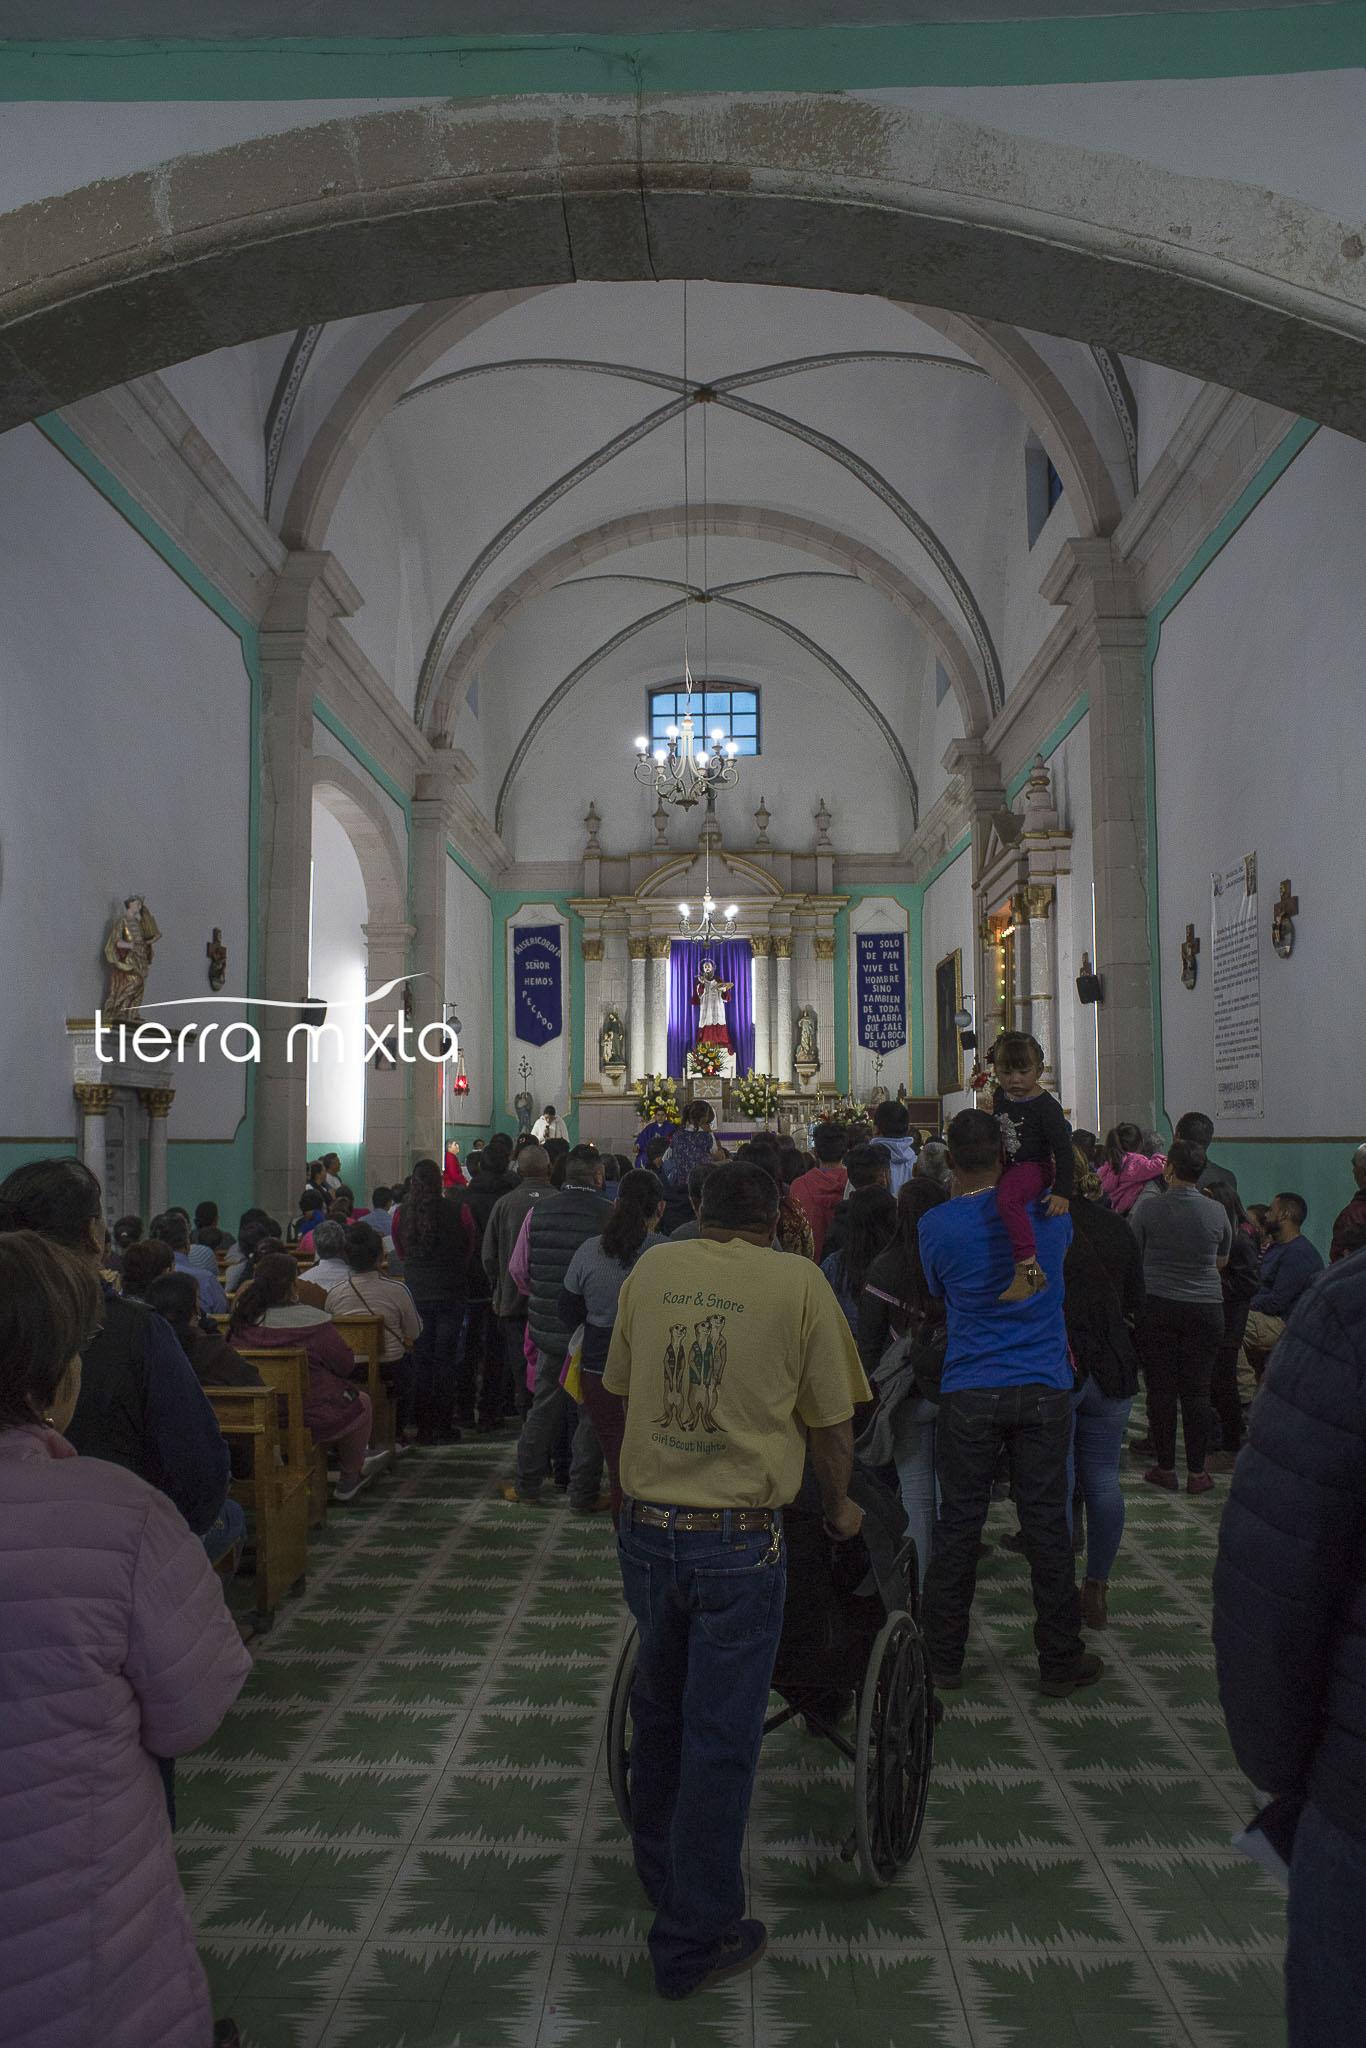 La Sauceda_Tierra Mixta_Cristian Herrera_2020__13